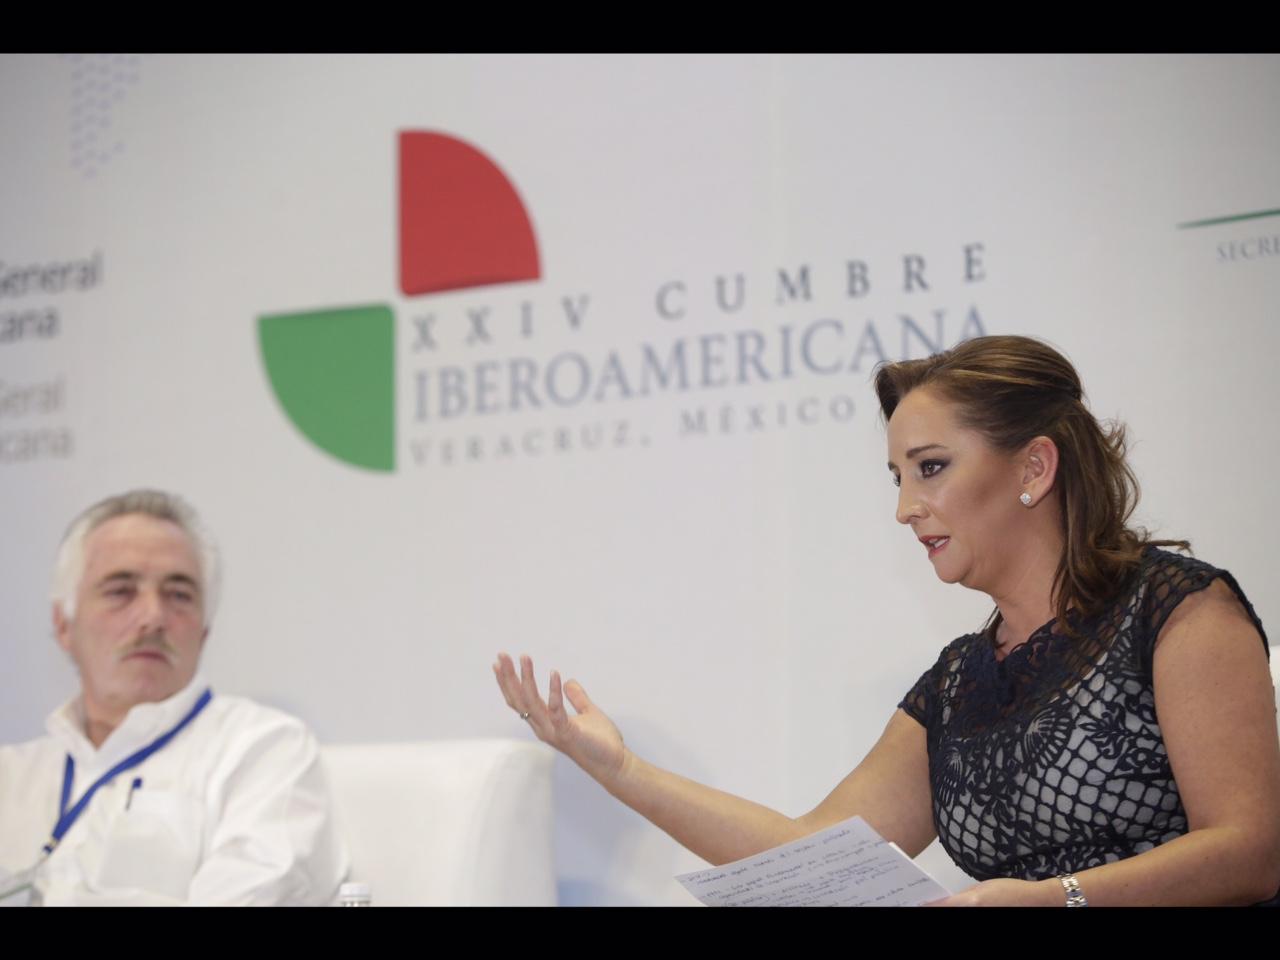 xxiv cumbre iberoamericana veracruzjpg